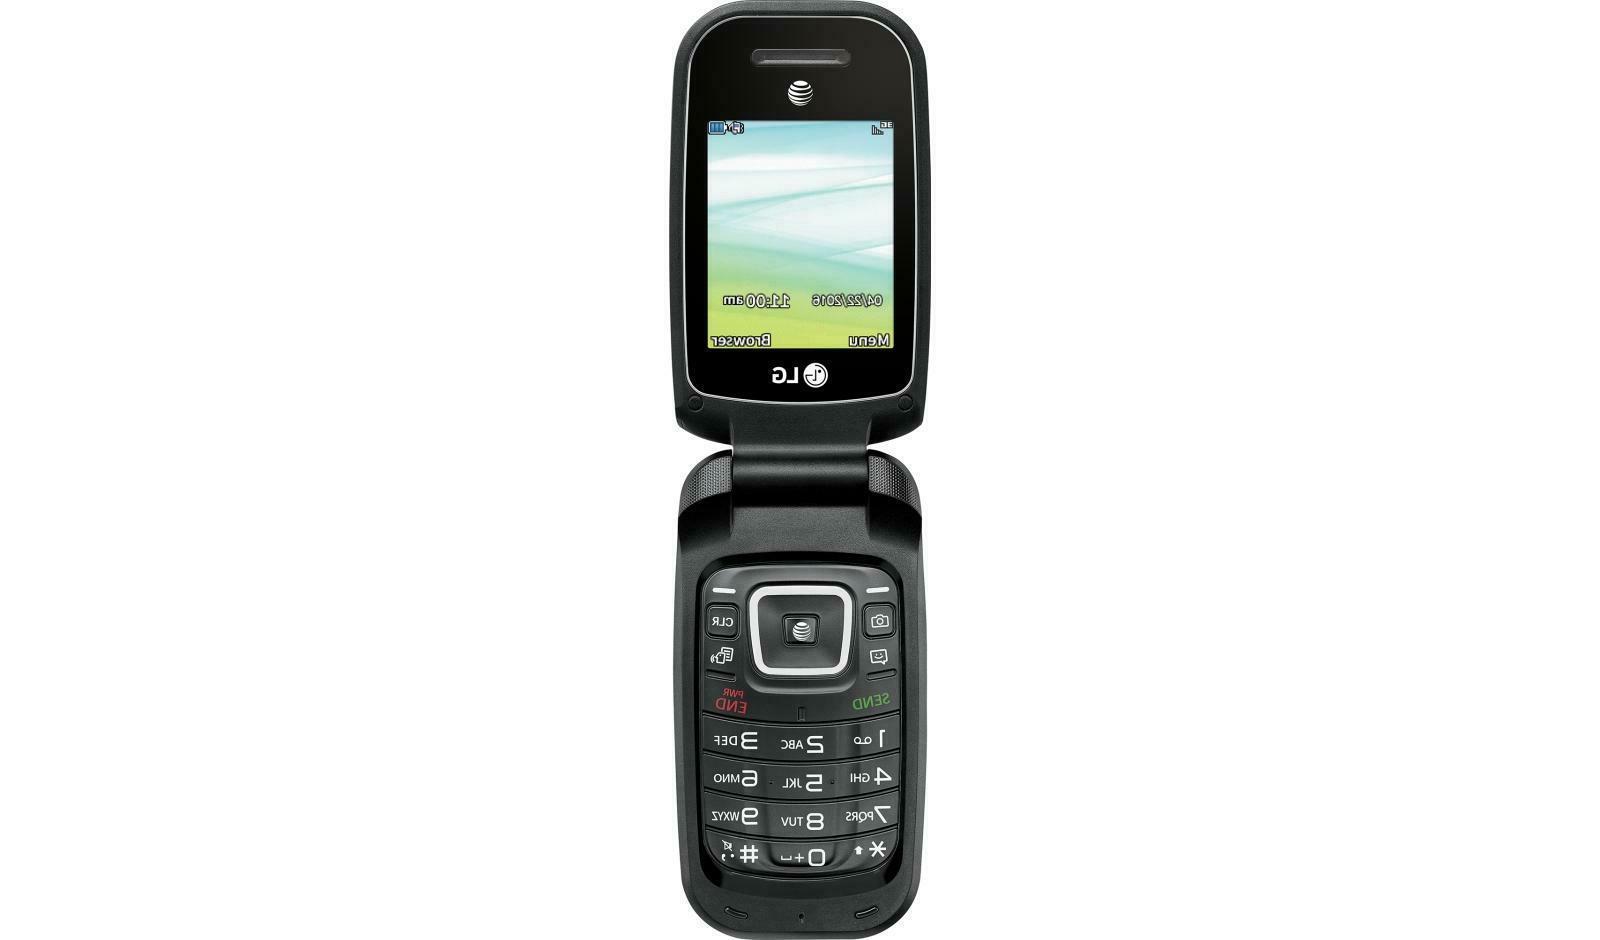 LG AT&T Prepaid Basic Phone, Black - to